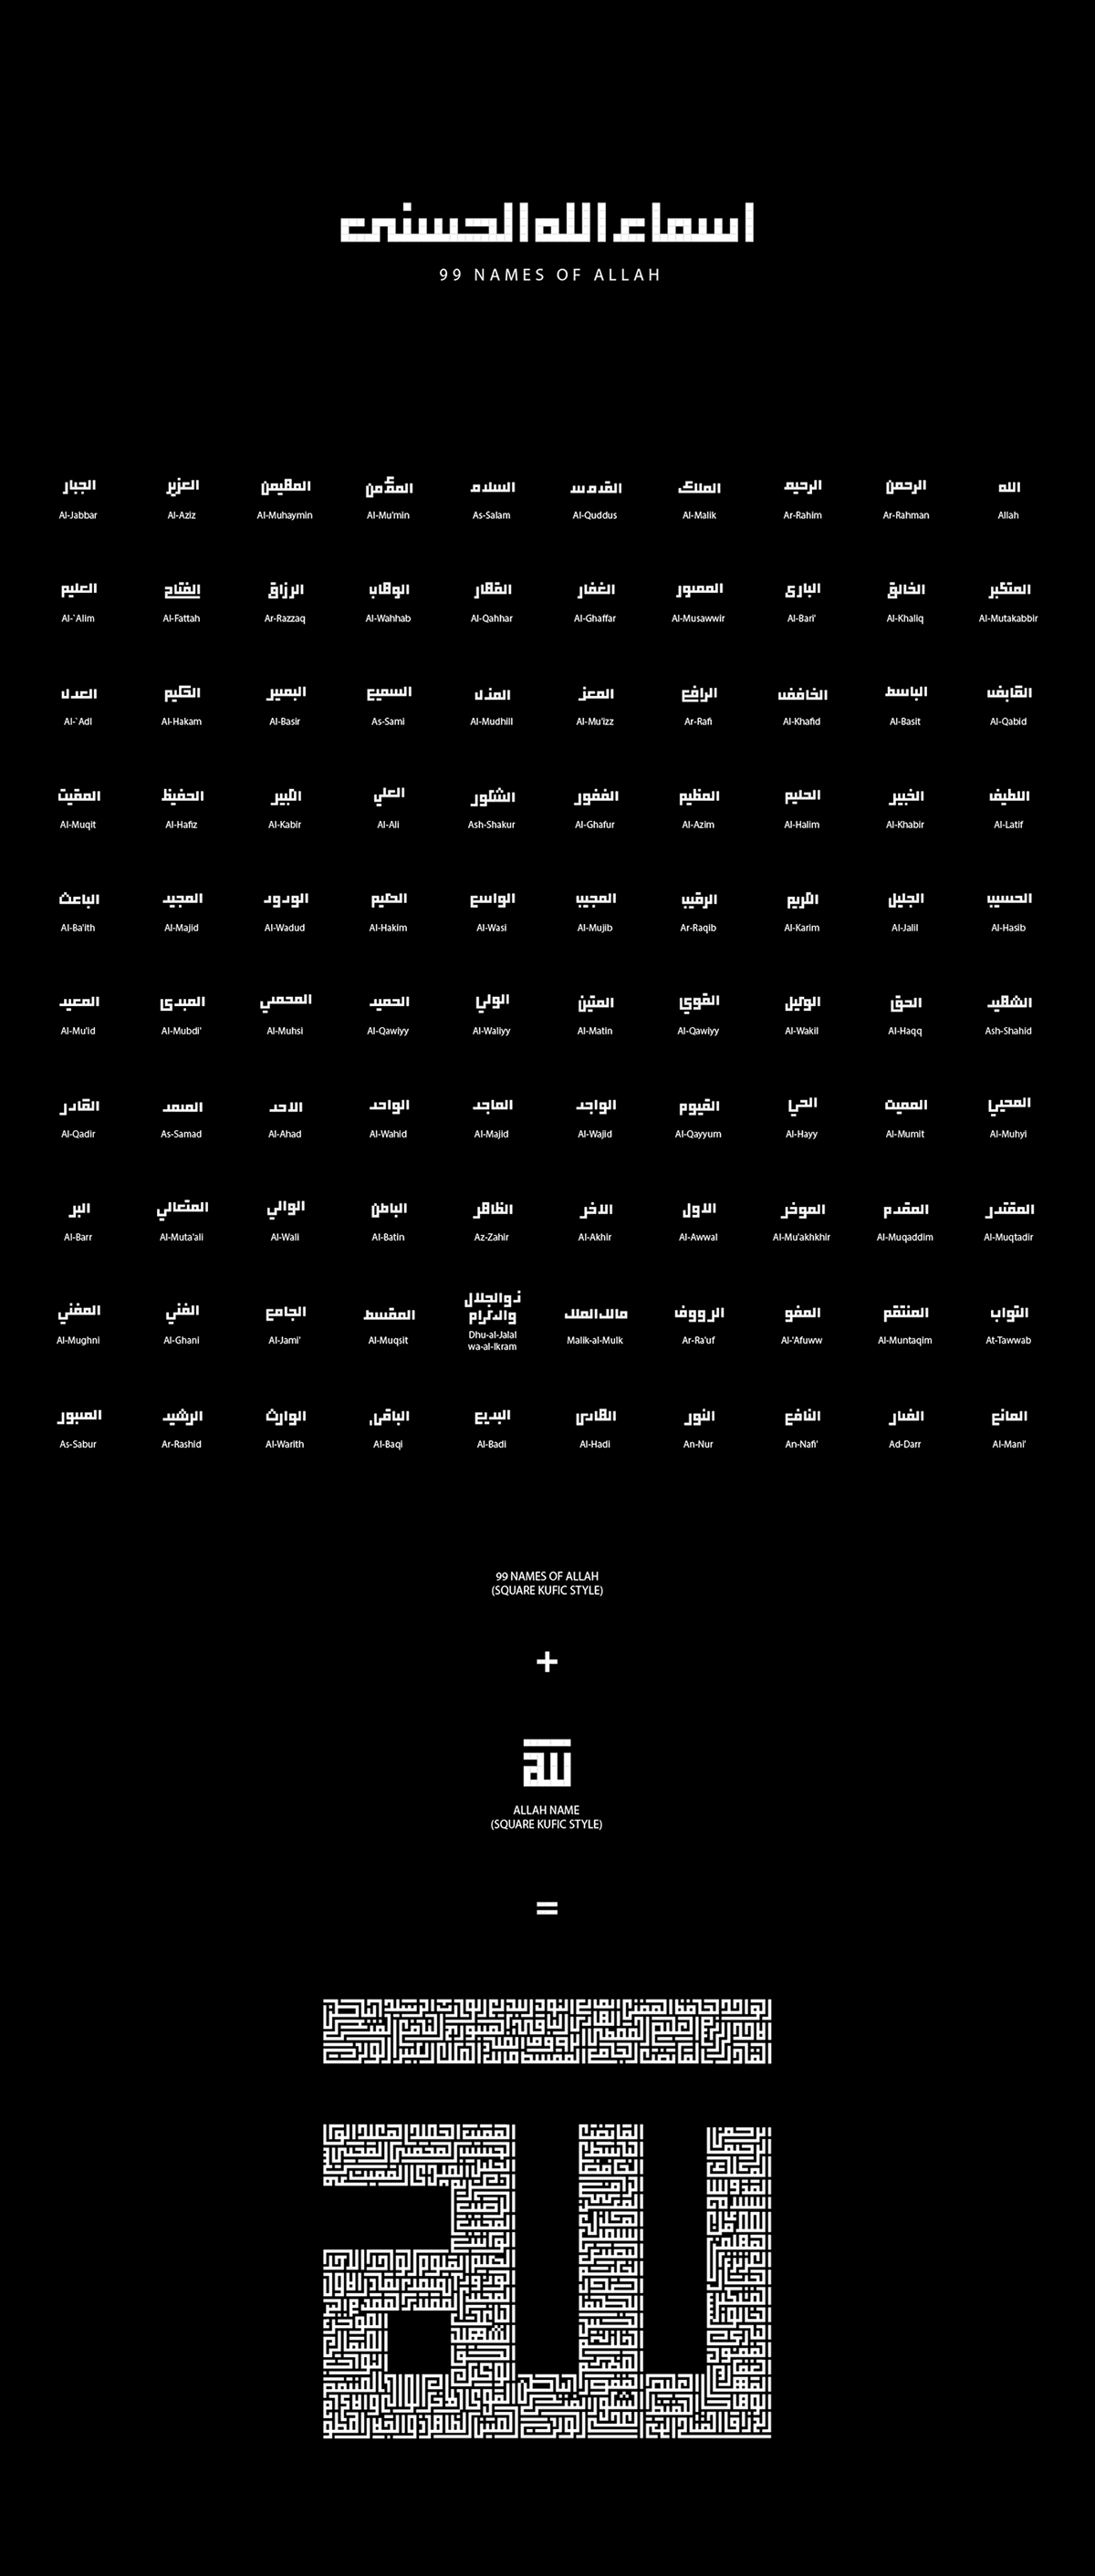 99 Names Of Allah On Wacom Gallery